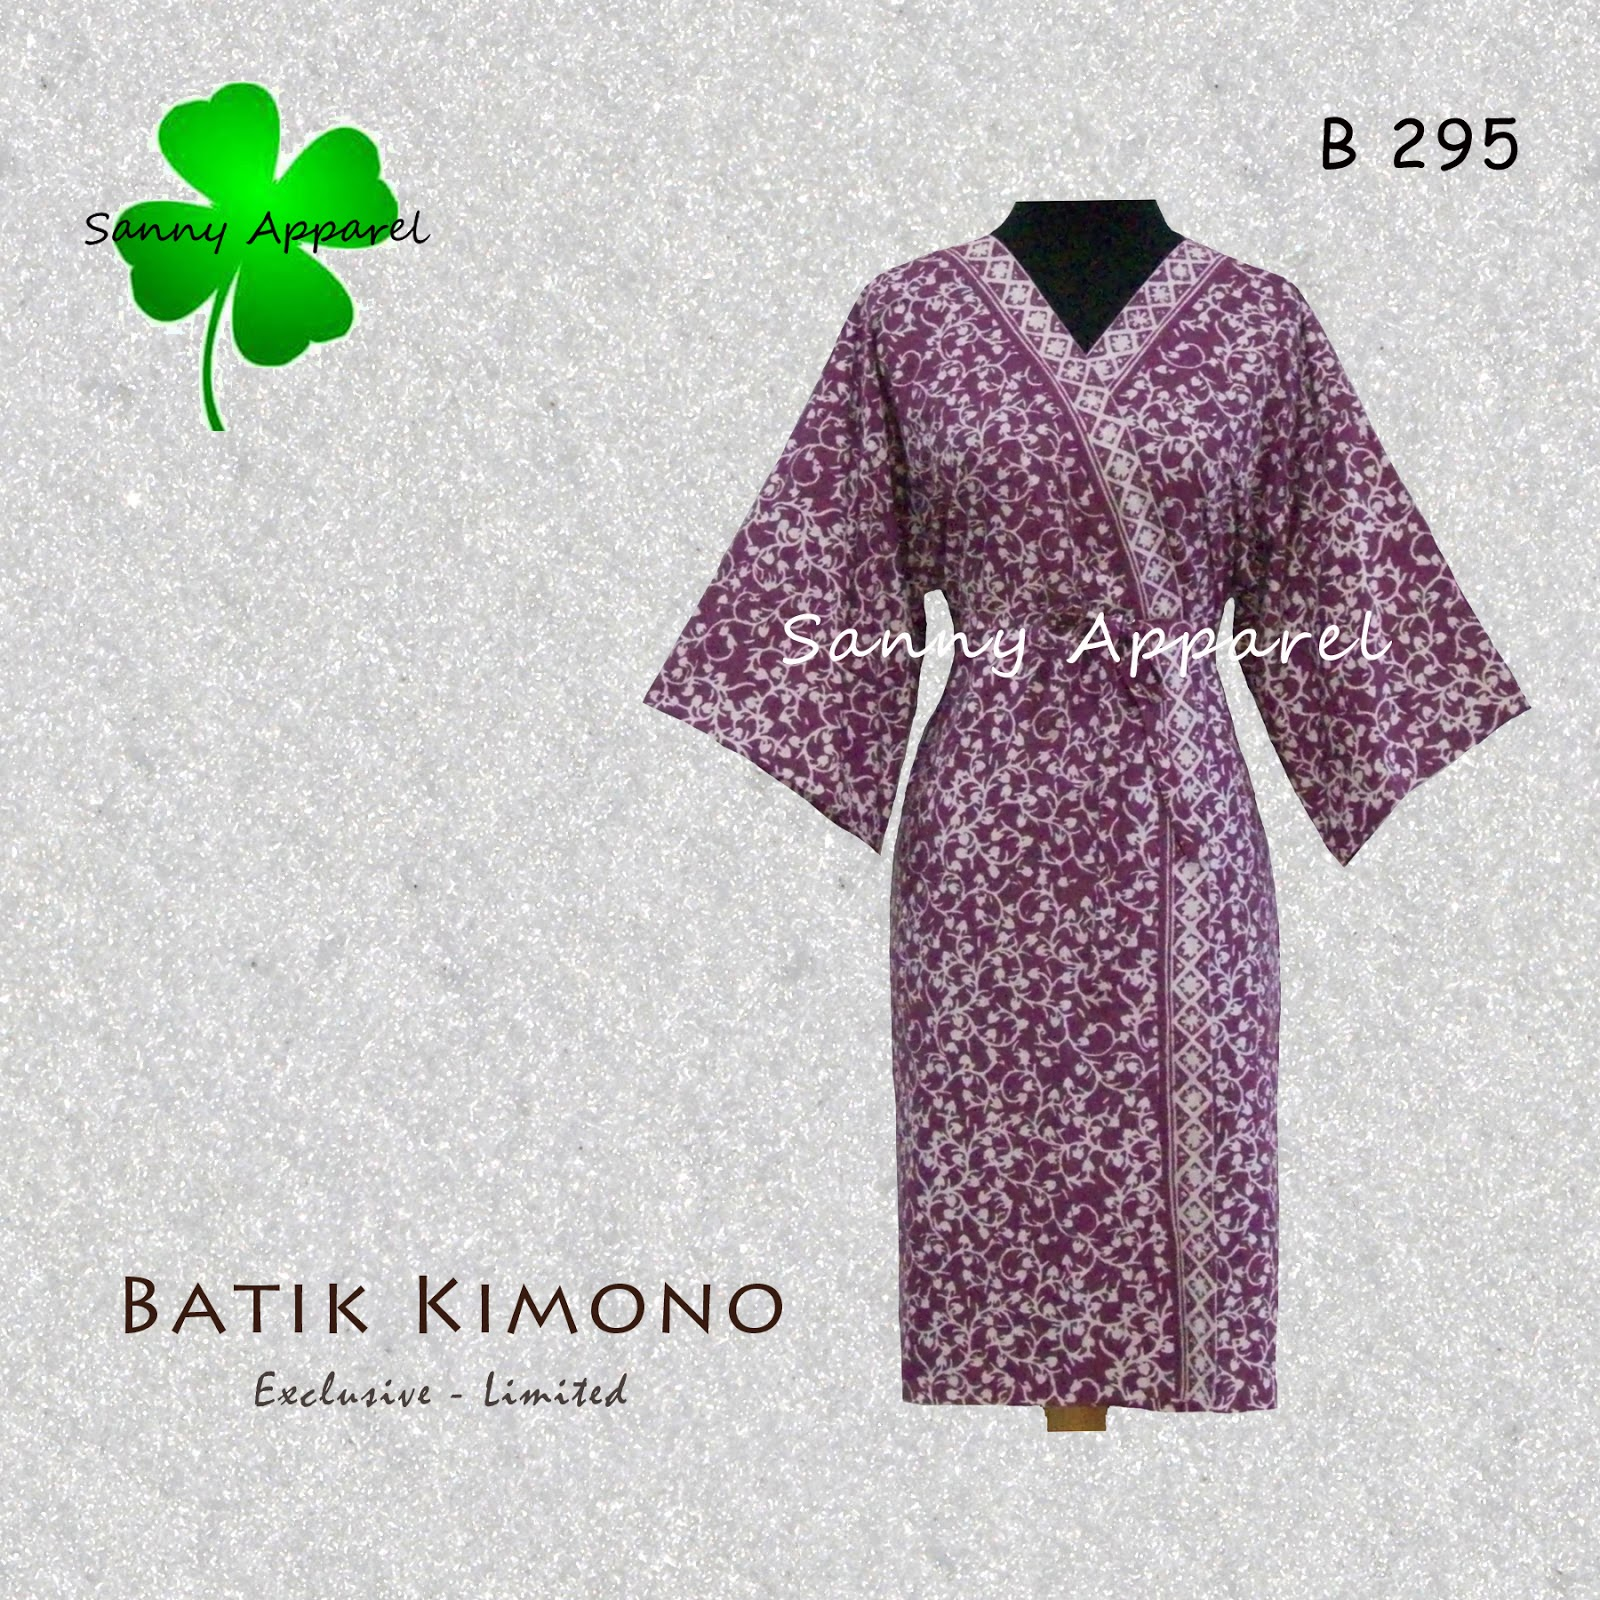 Sanny Apparel Kx 010 Kimono Satin Print Merah Maroon Daftar Harga Herrta Piyama Baju Tidur Sleepwear Wanita Cewek Dewasa Ibu Hamil Menyusui Celana Panjang Katun Jepang 8013 Setelan Sexy Seserahan 38328129 Ribbon Source